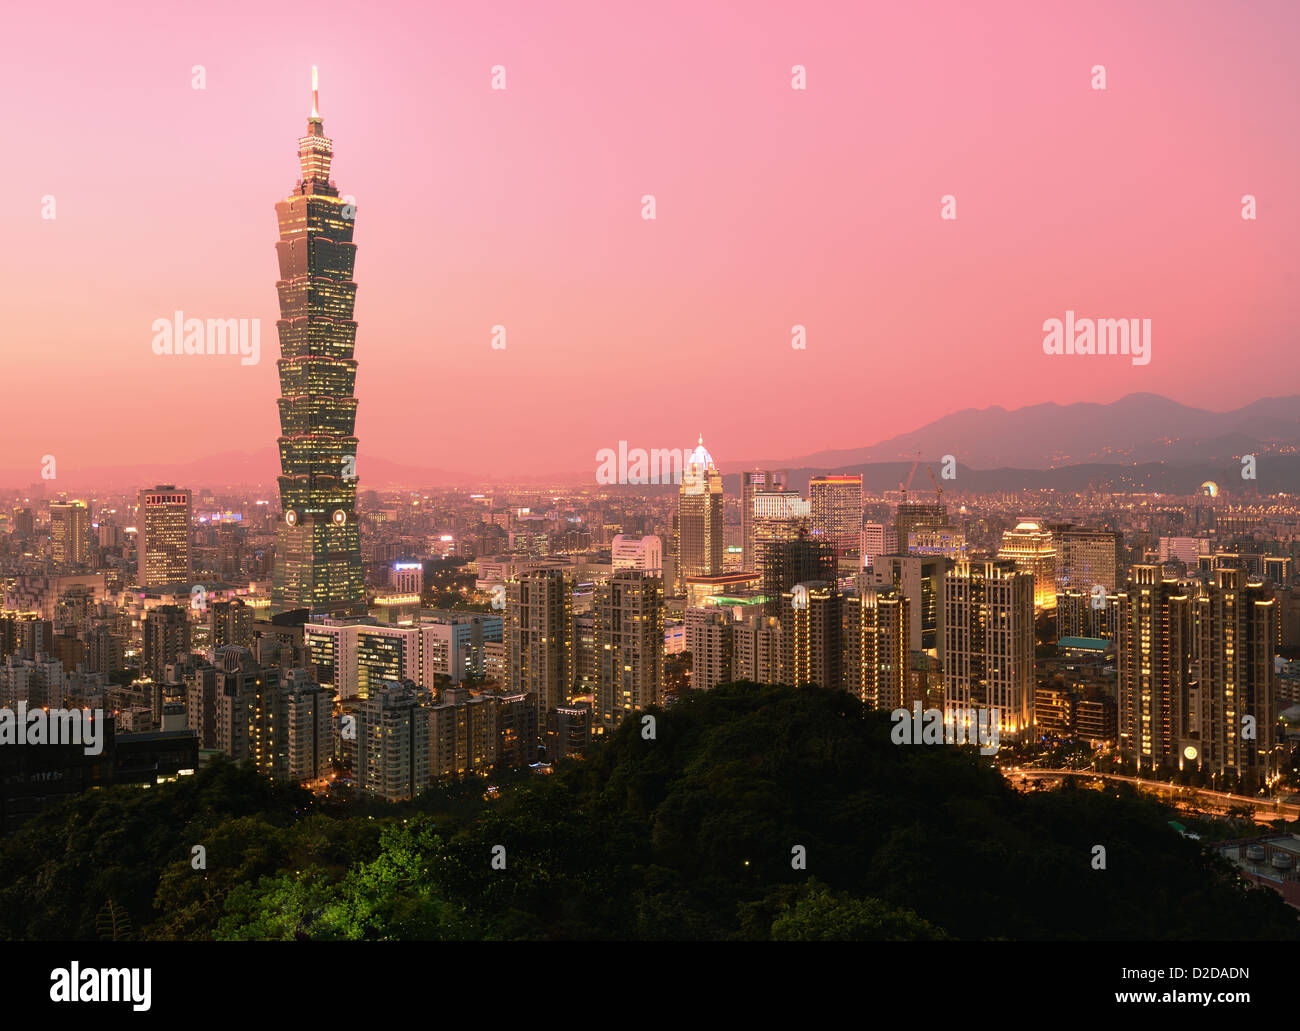 Taipei, Taiwán noche skyline. Imagen De Stock